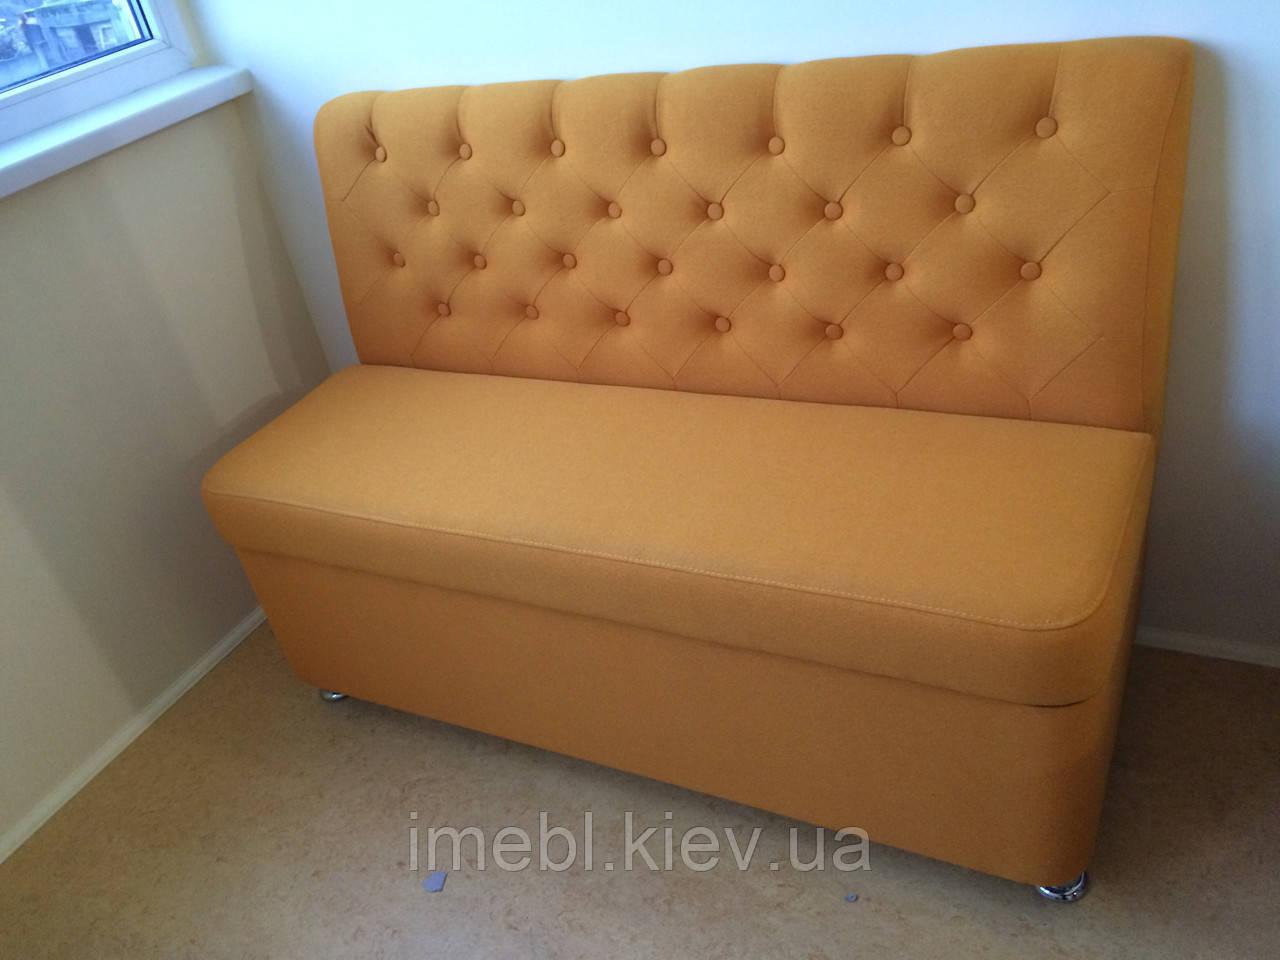 Мягкий диван на кухню или балкон (Оранжевый)